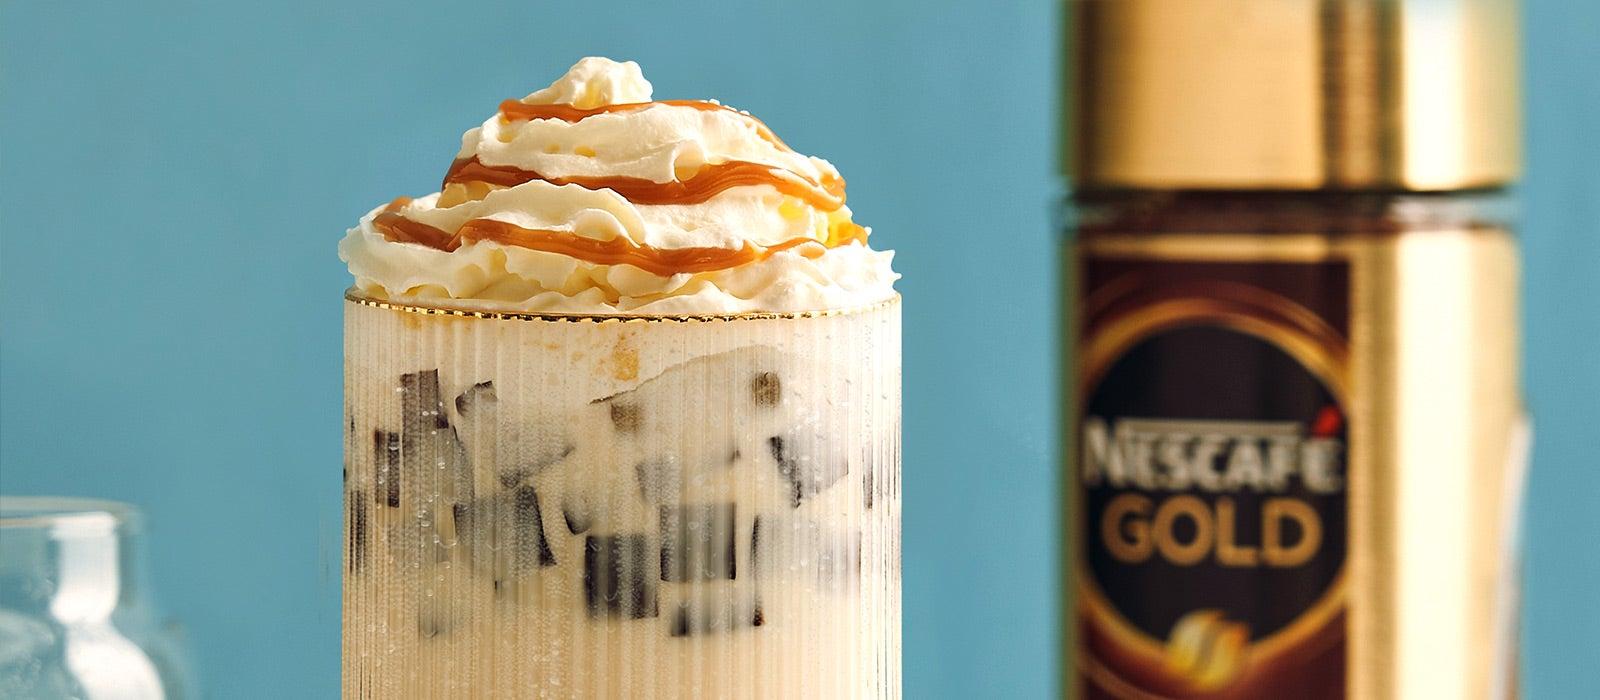 nescafe-gold-iced-caramel-coffee-jelly-recipe-banner_0.jpg